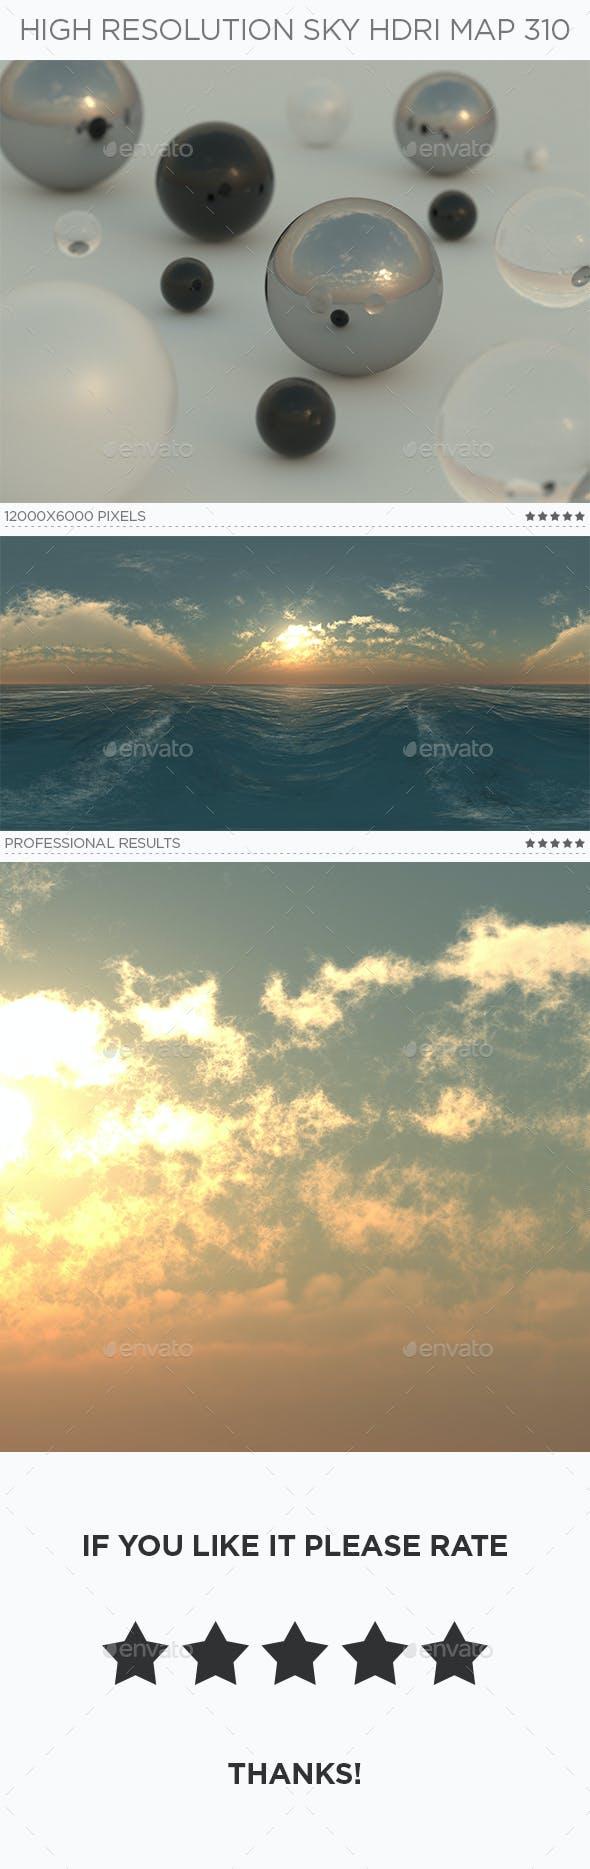 High Resolution Sky HDRi Map 310 - 3DOcean Item for Sale